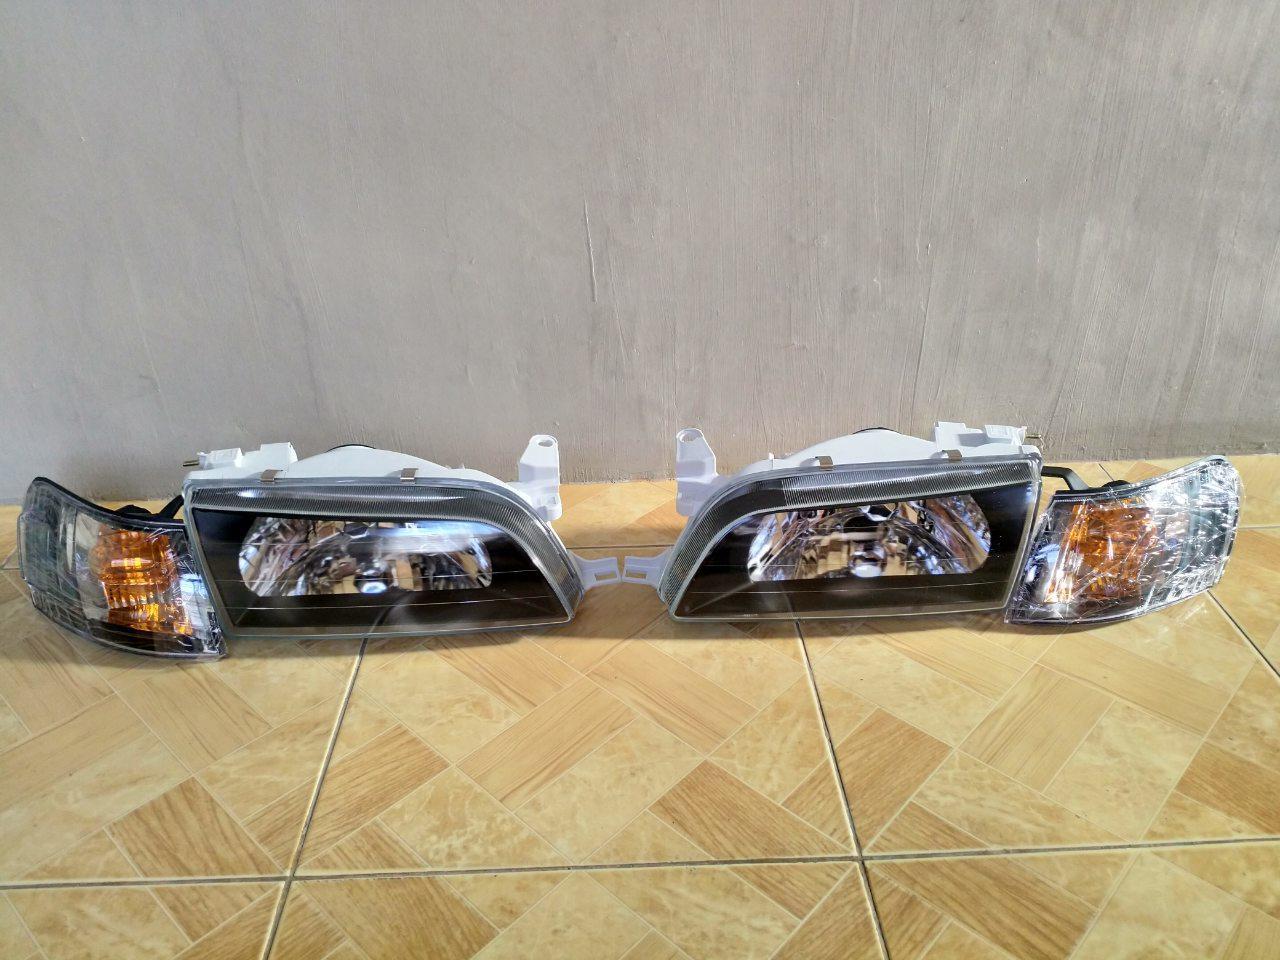 Toyota Ae101 Smoke Big Body Glass Head Light & Clearance Light Set By Chrisotopyeza.